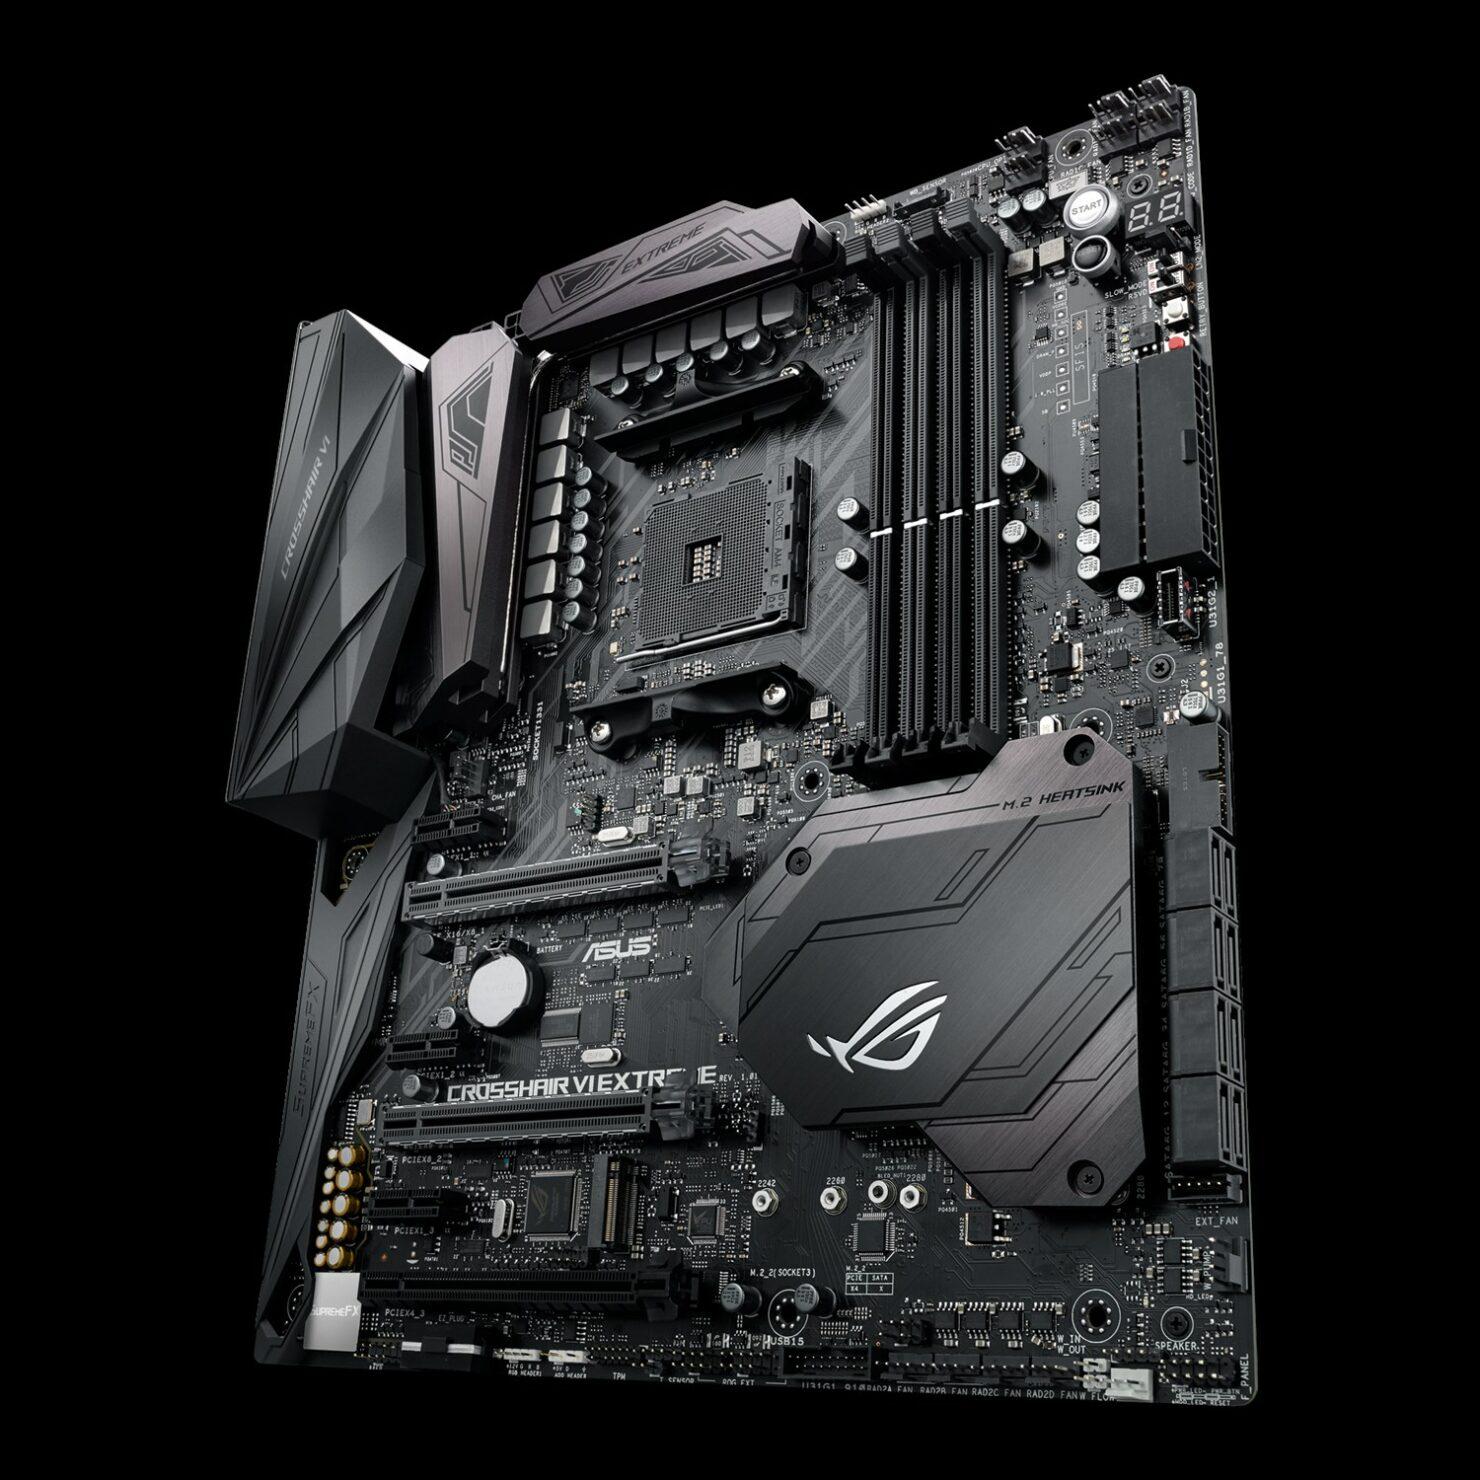 asus-rog-crosshair-vi-extreme-x370-motherboard_7-3